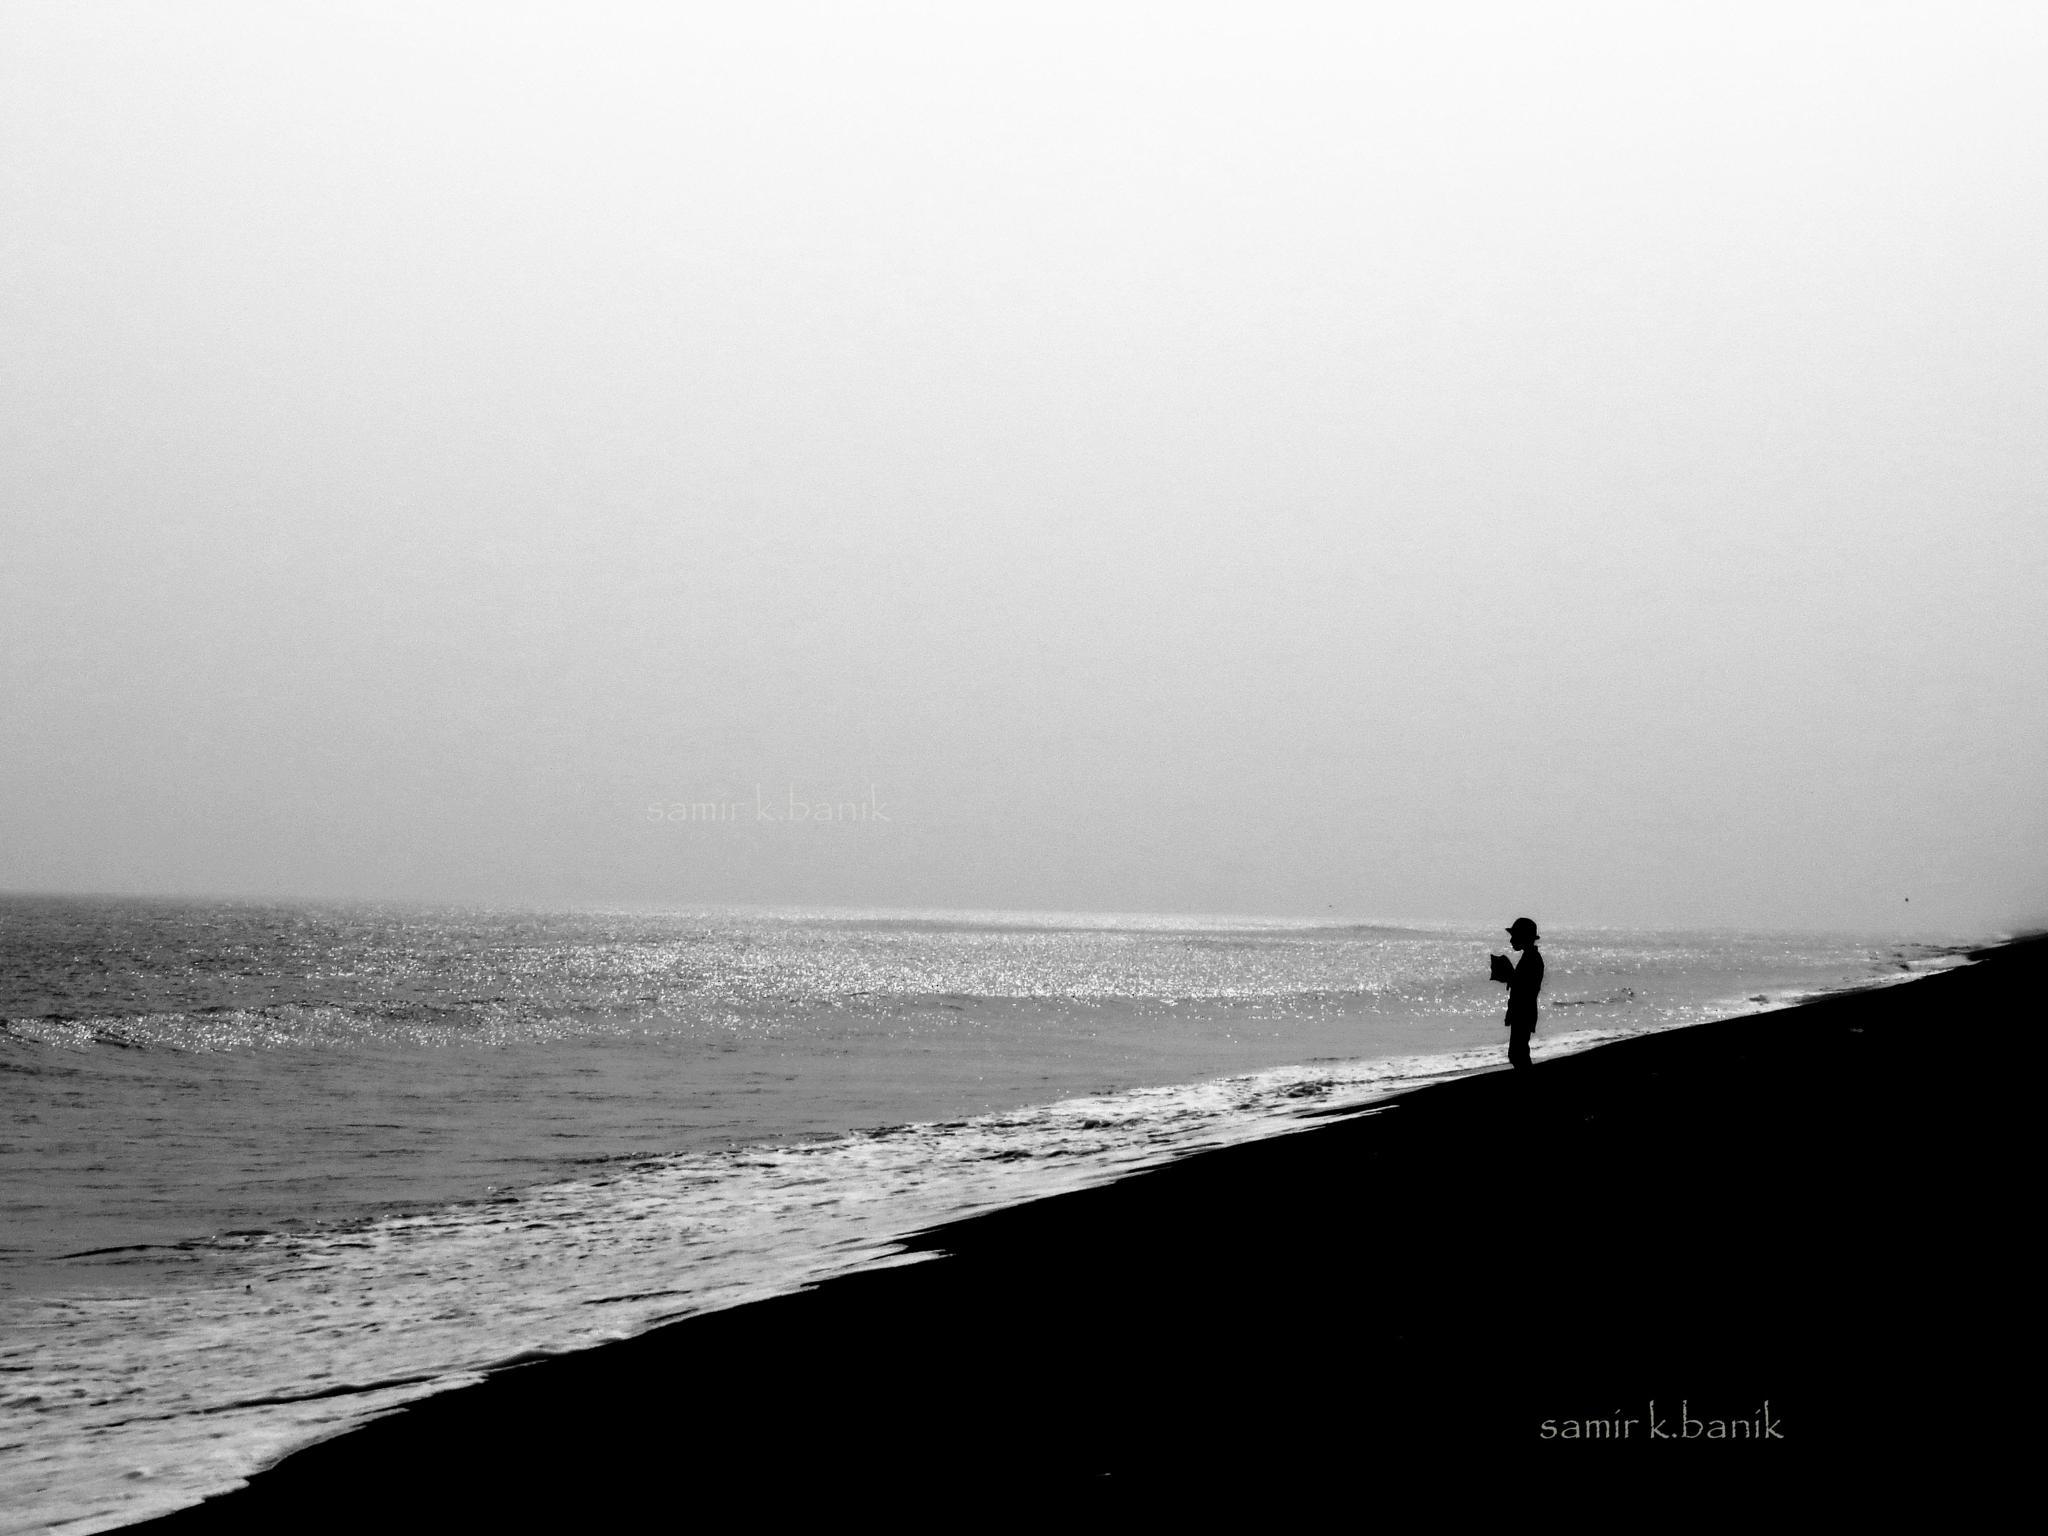 alone by samir.banik